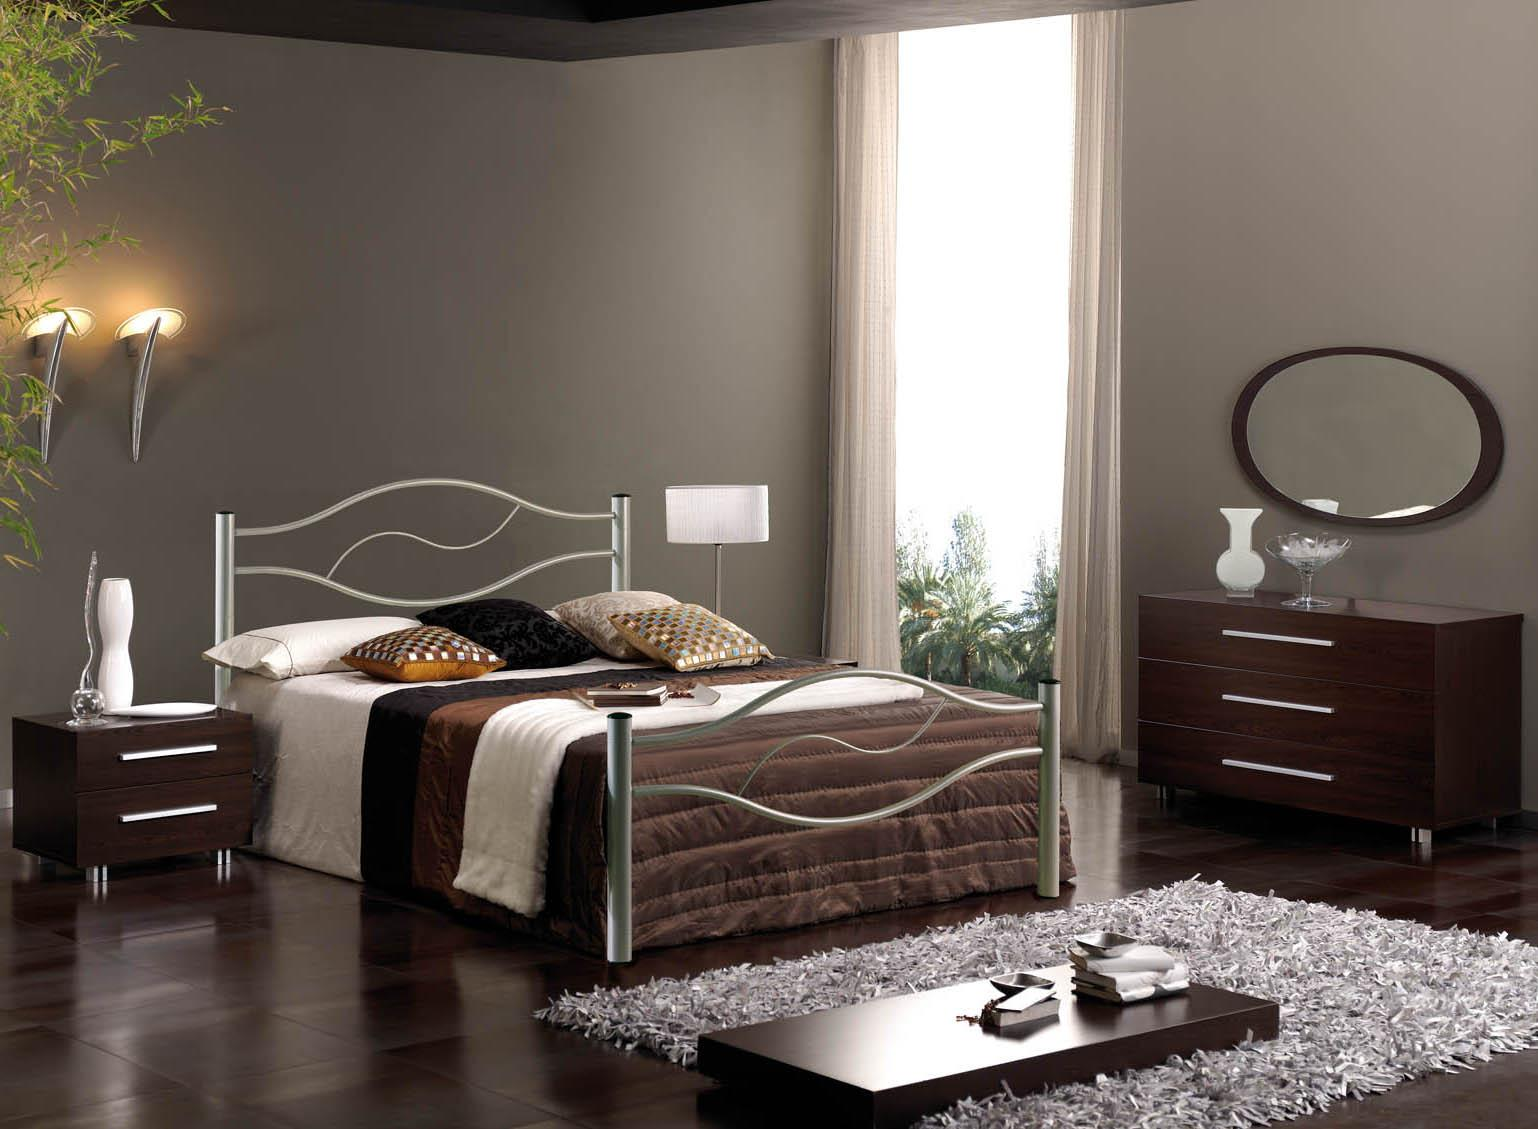 small bedroom furniture arrangement ideas photo - 9